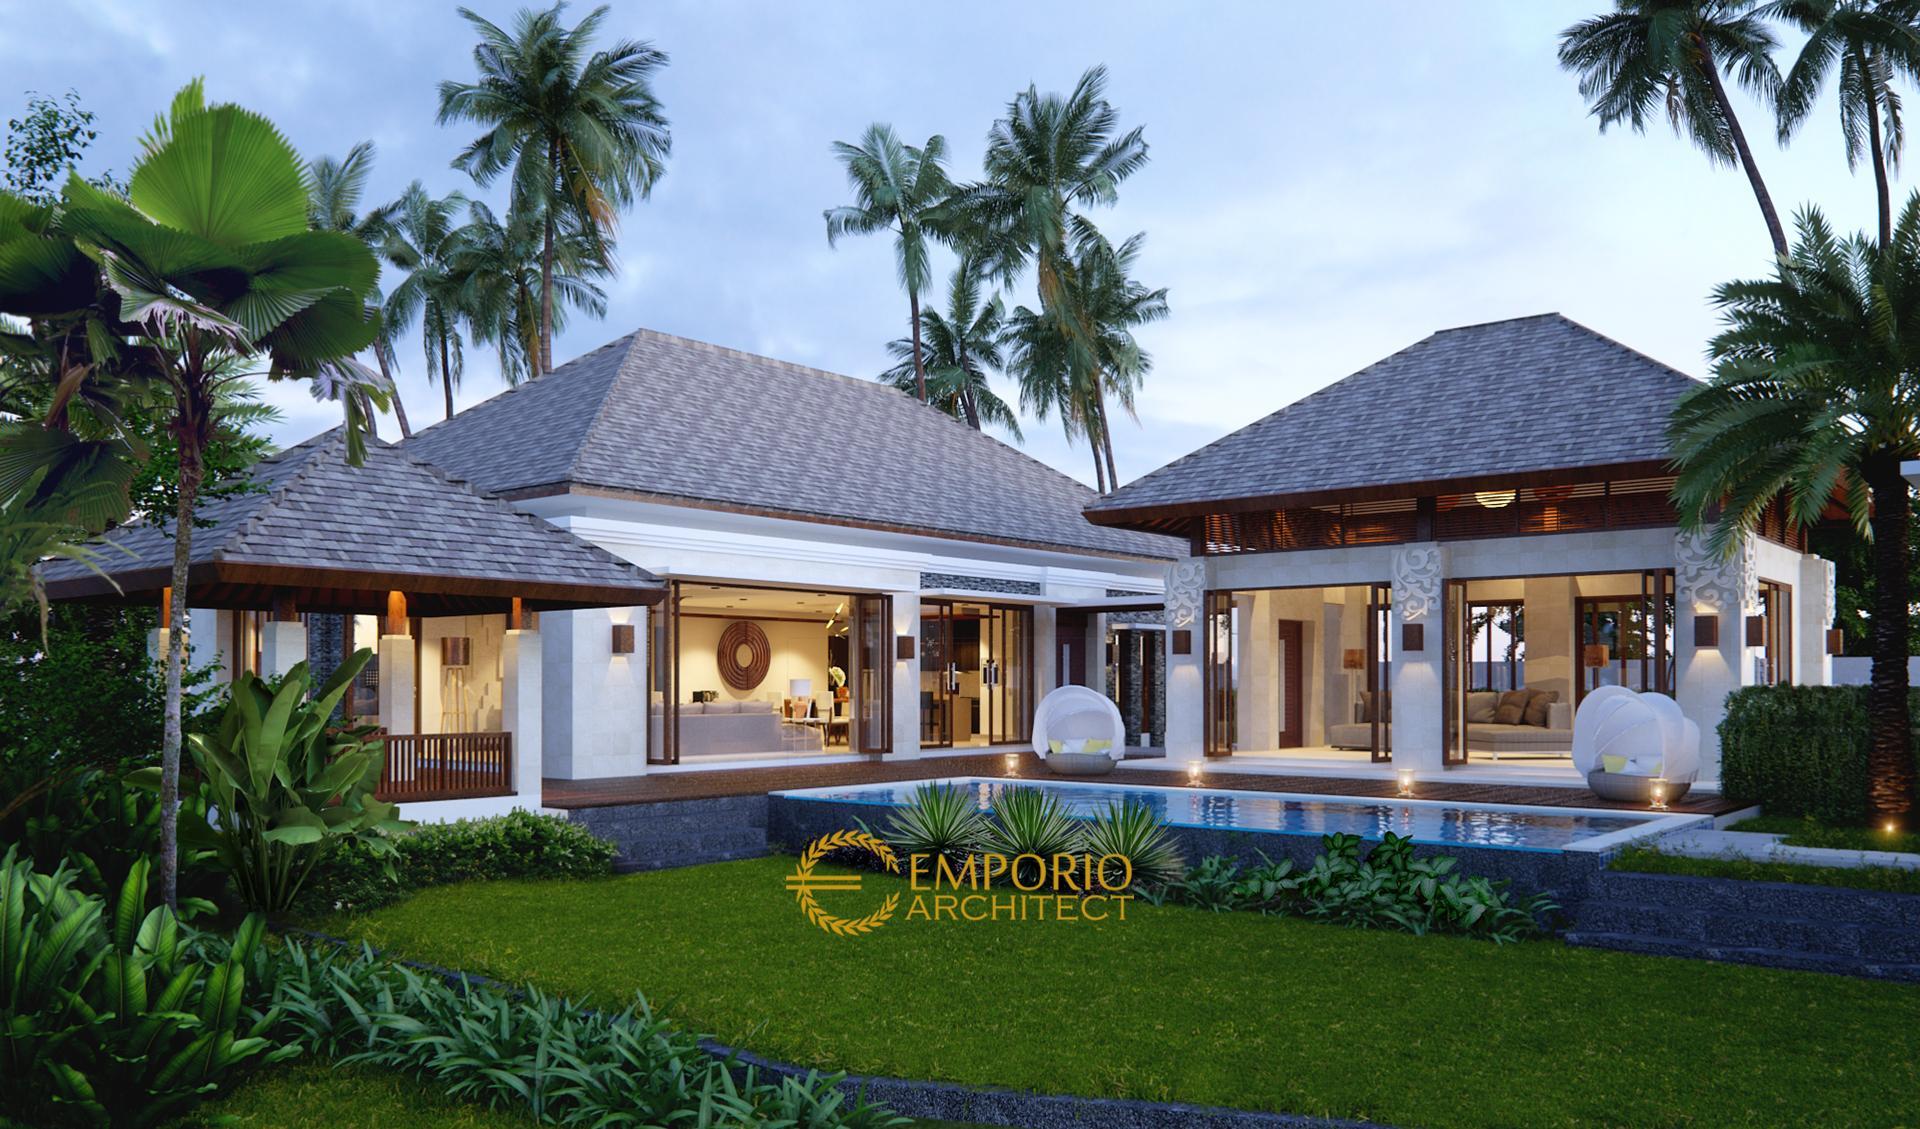 Mrs. Heri Villa Bali House 2 Floors Design - Pamulang, Tangerang Selatan